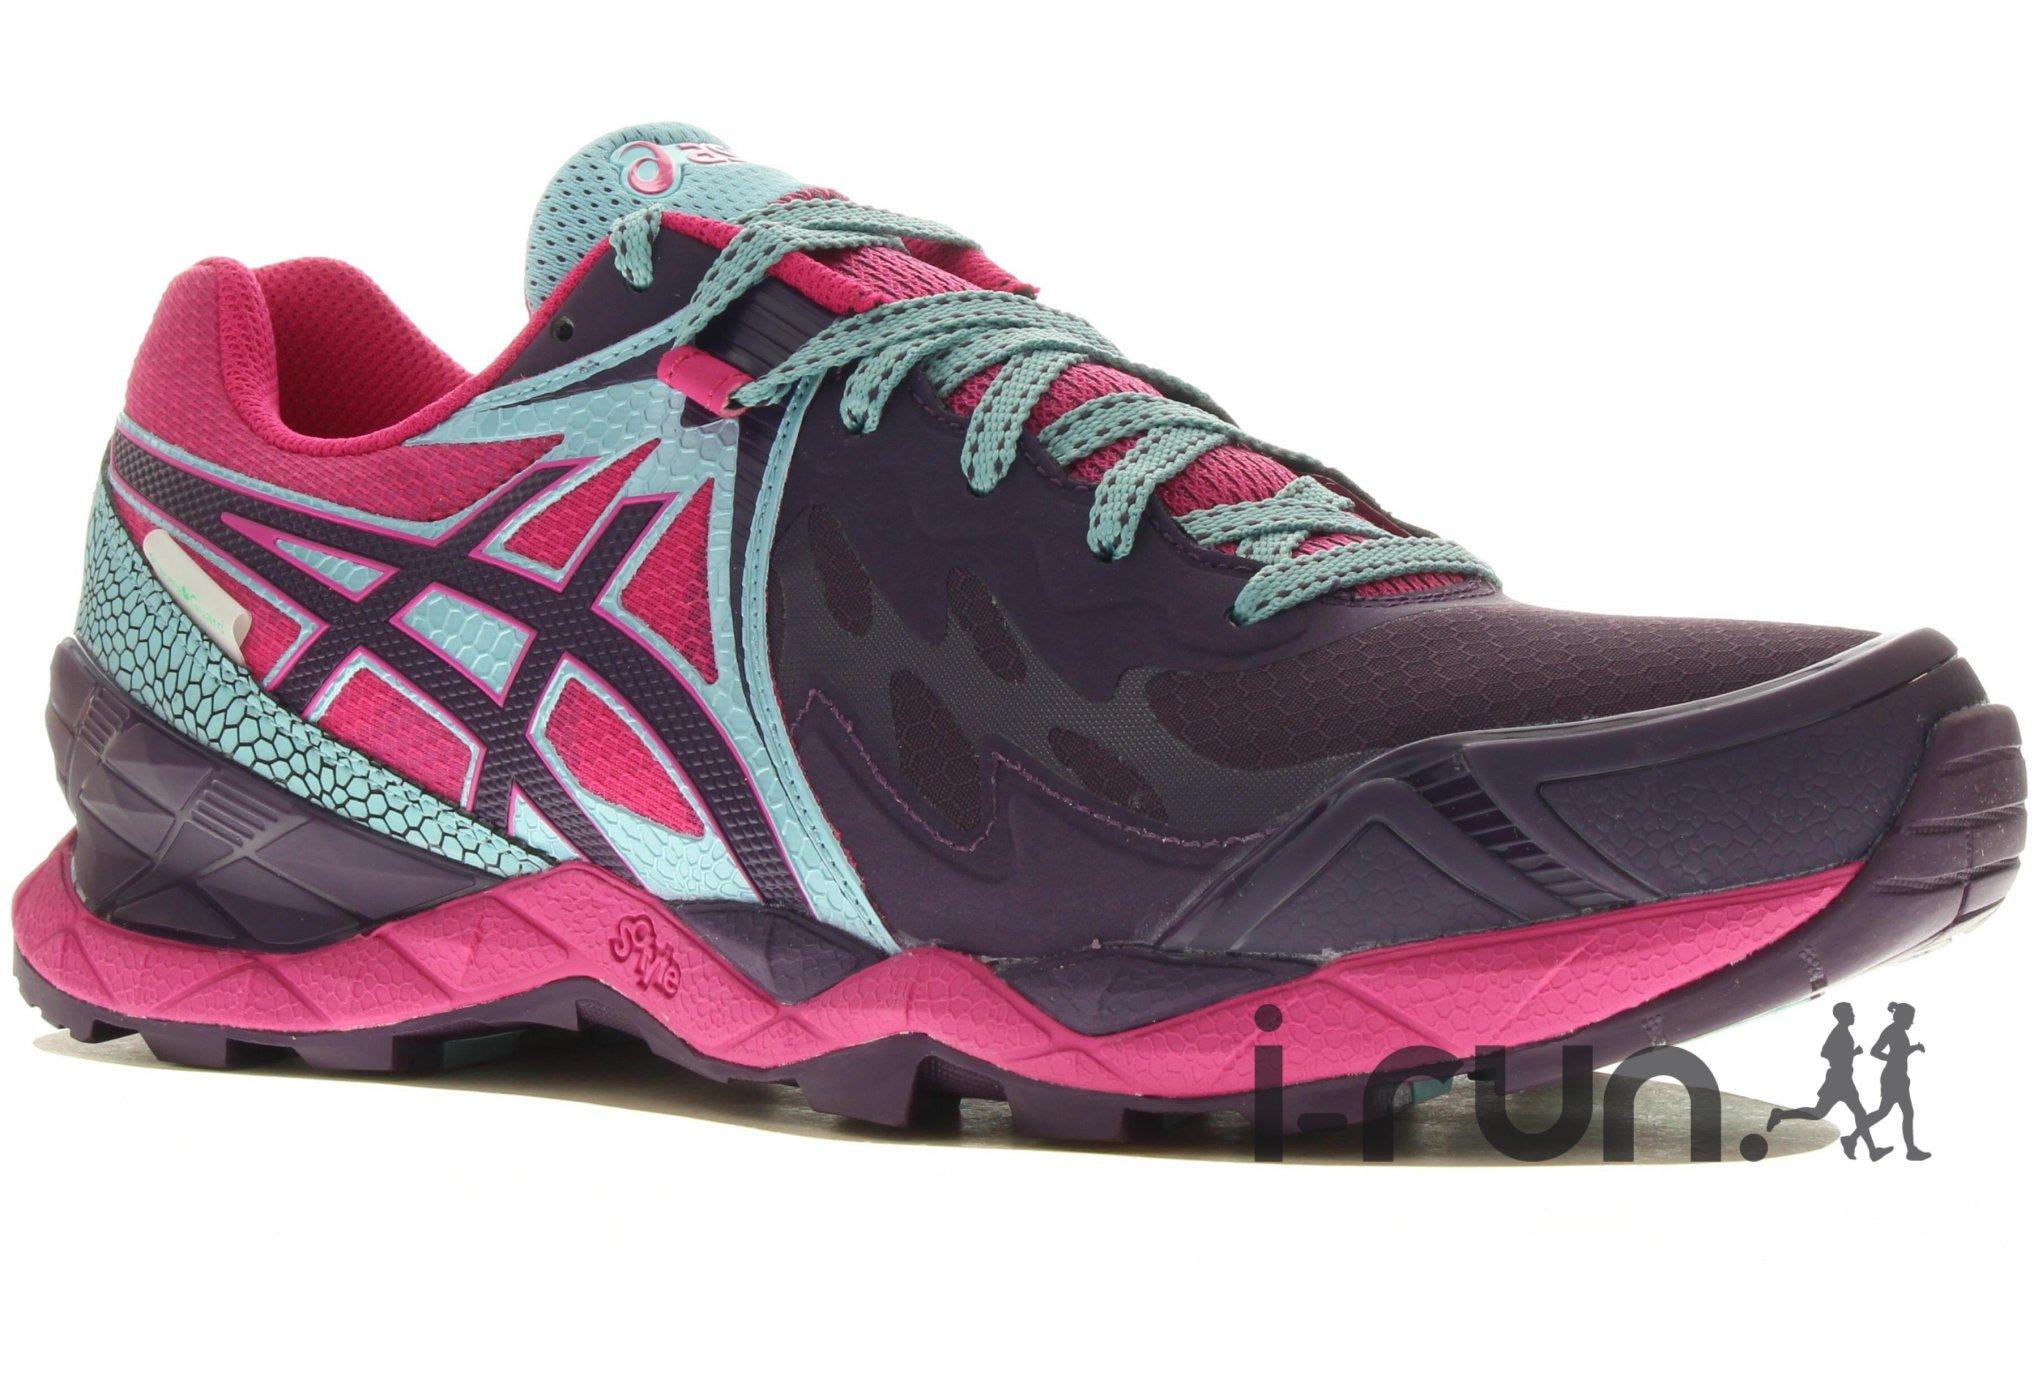 Trail Chaussures Produits Running De Et Prix Femme Liste Asics SwdzcEpq